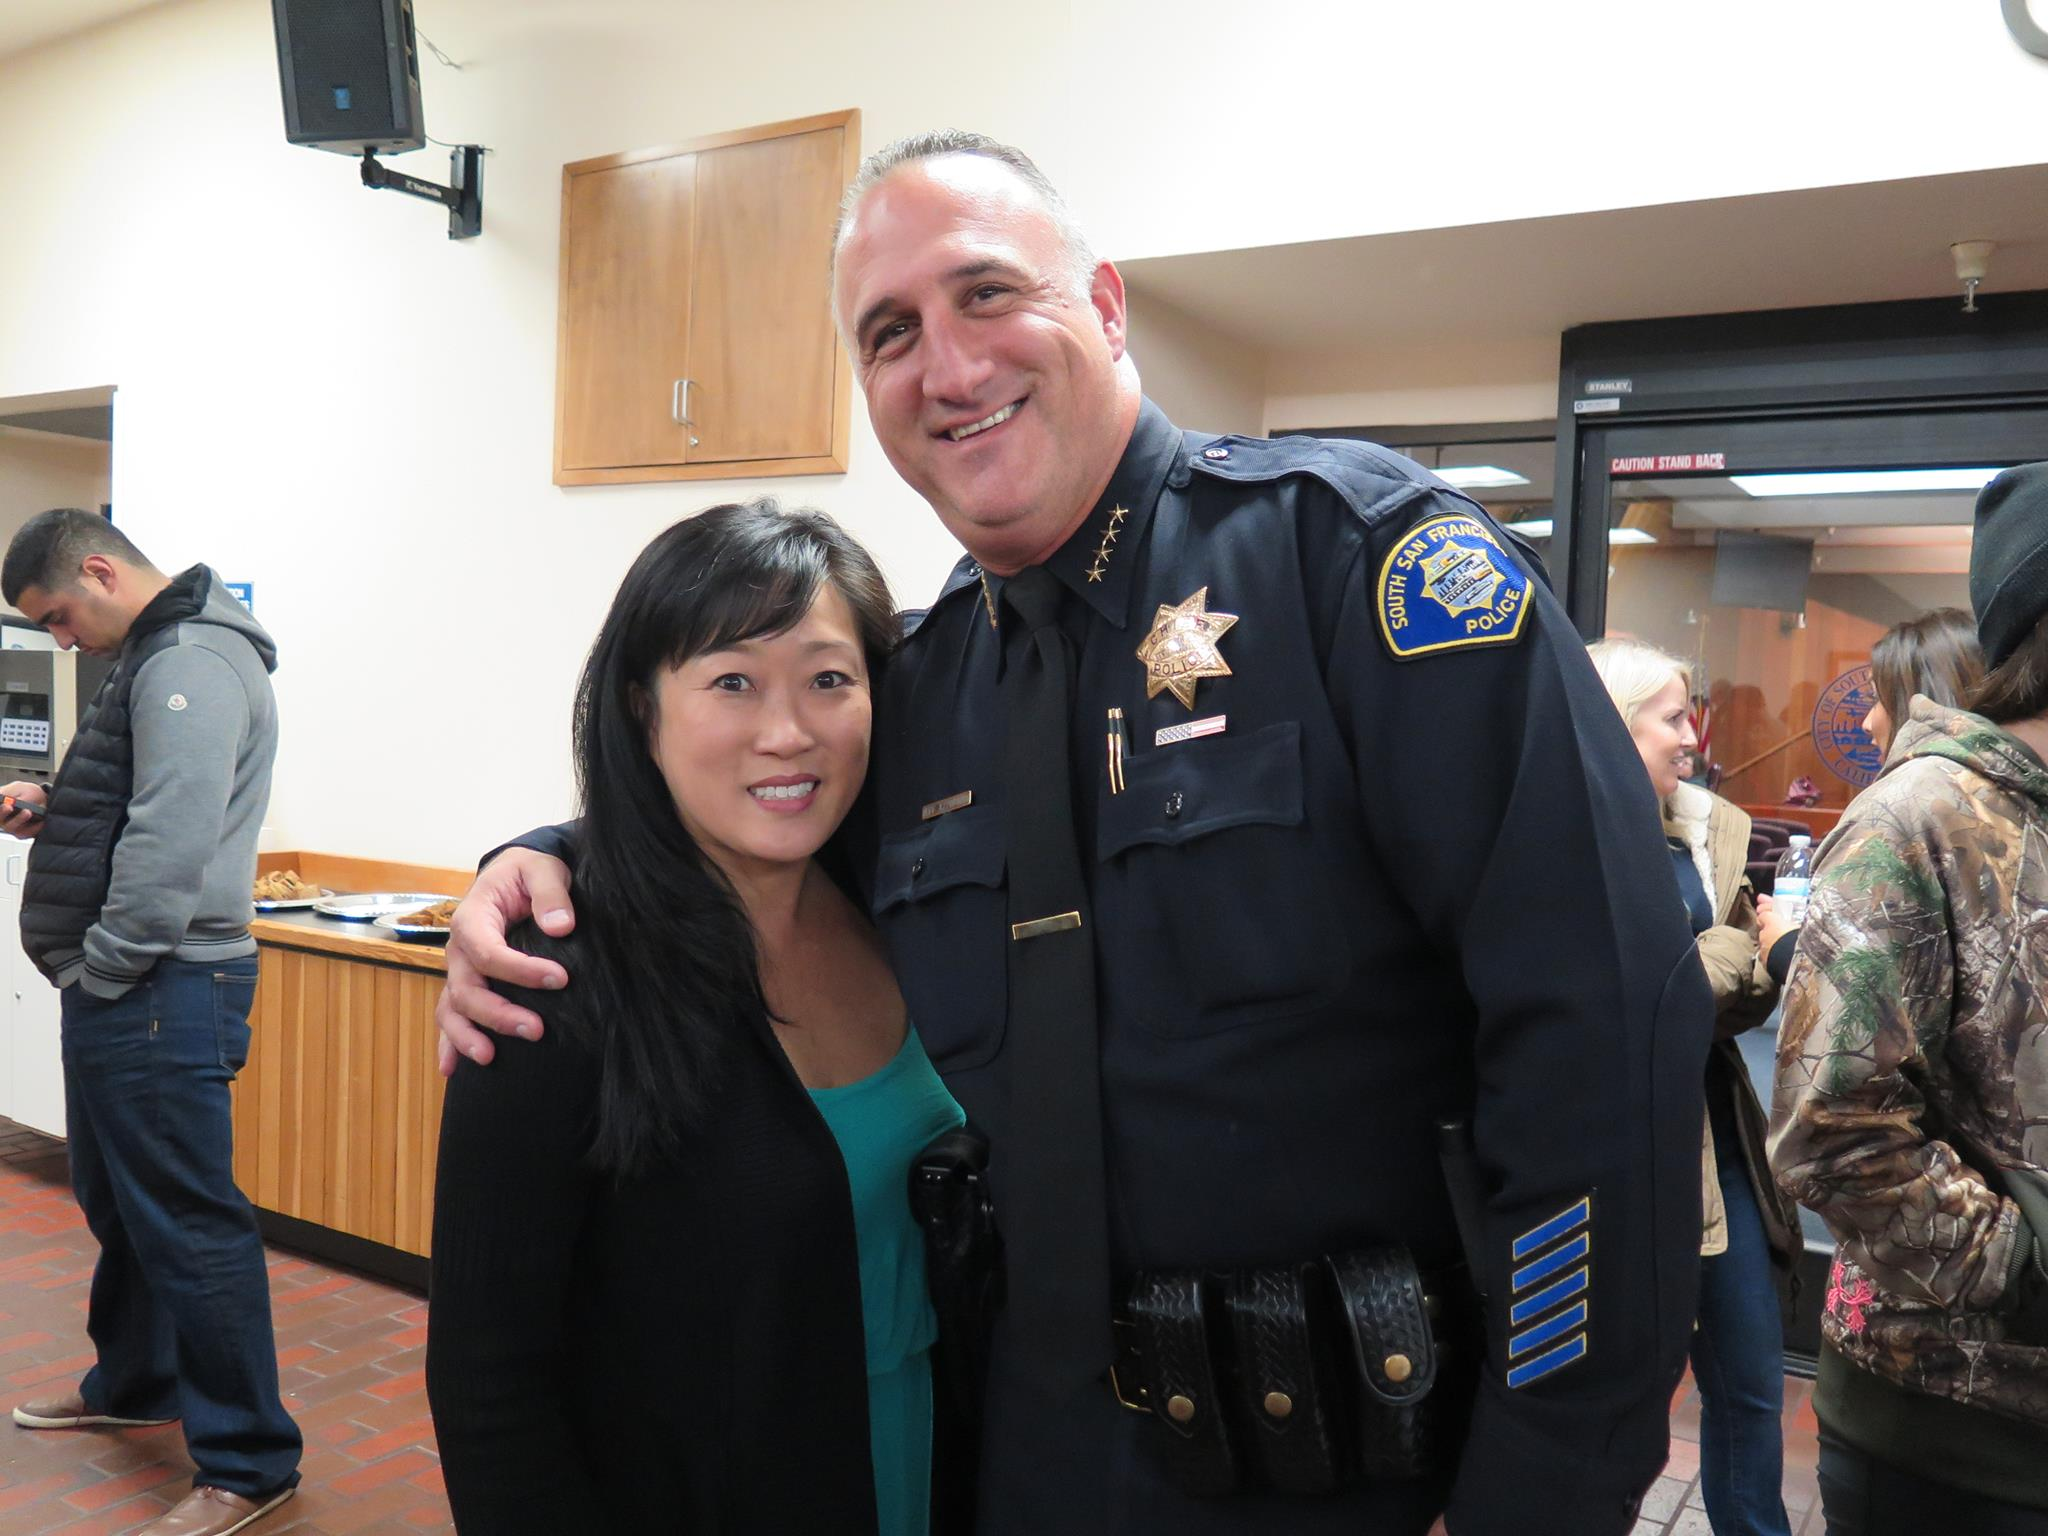 Councilwoman Liza Normandy with SSFPD Chief Jeff Azzopardi